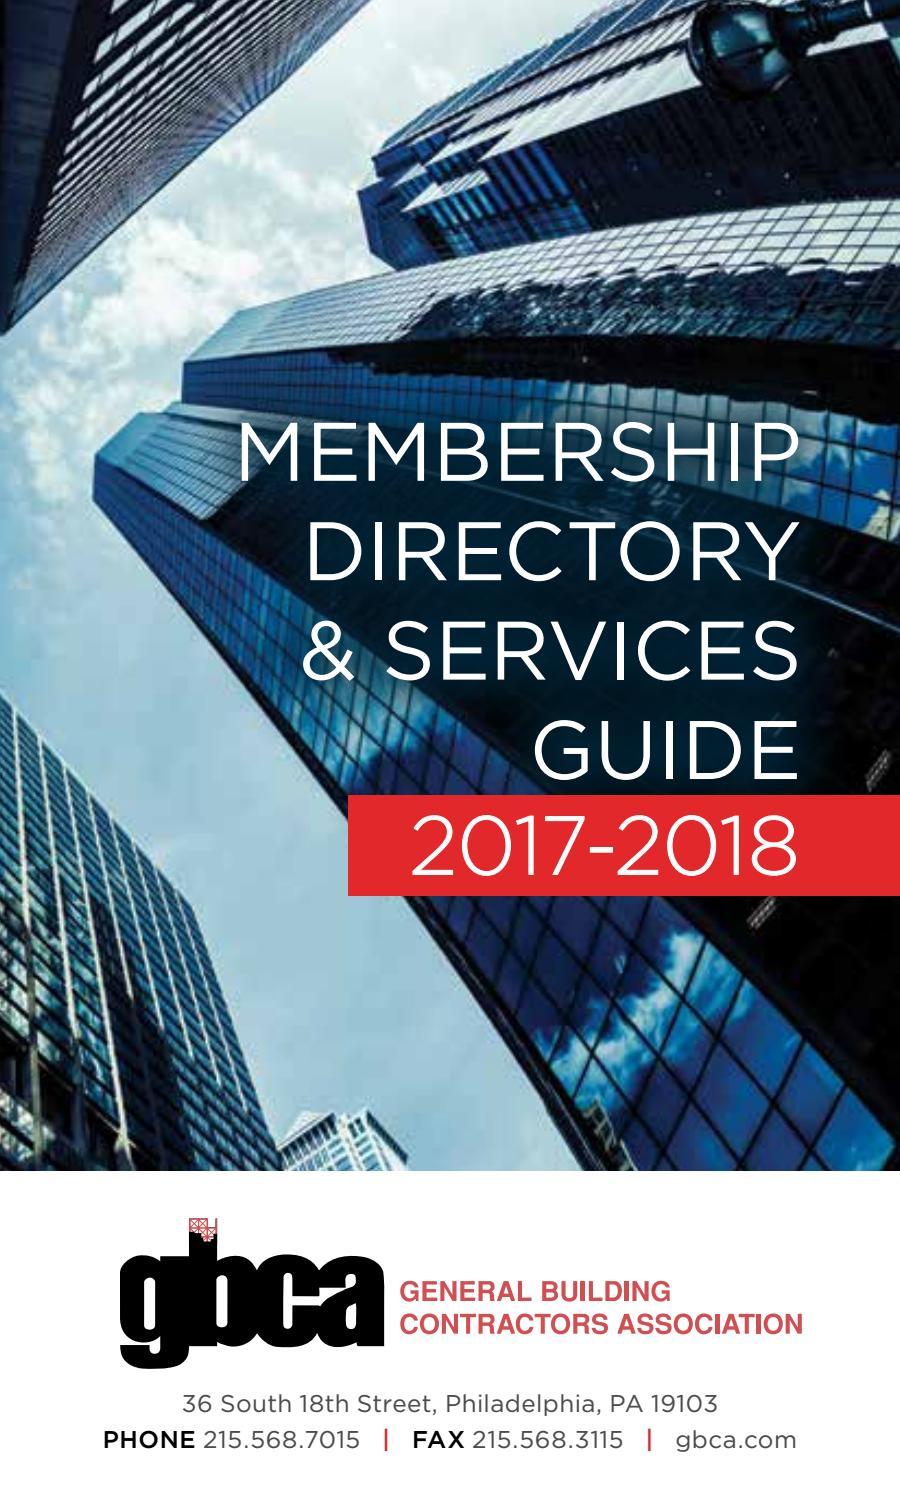 GBCA Membership Directory: 2017-2018 by General Building Contractors ...